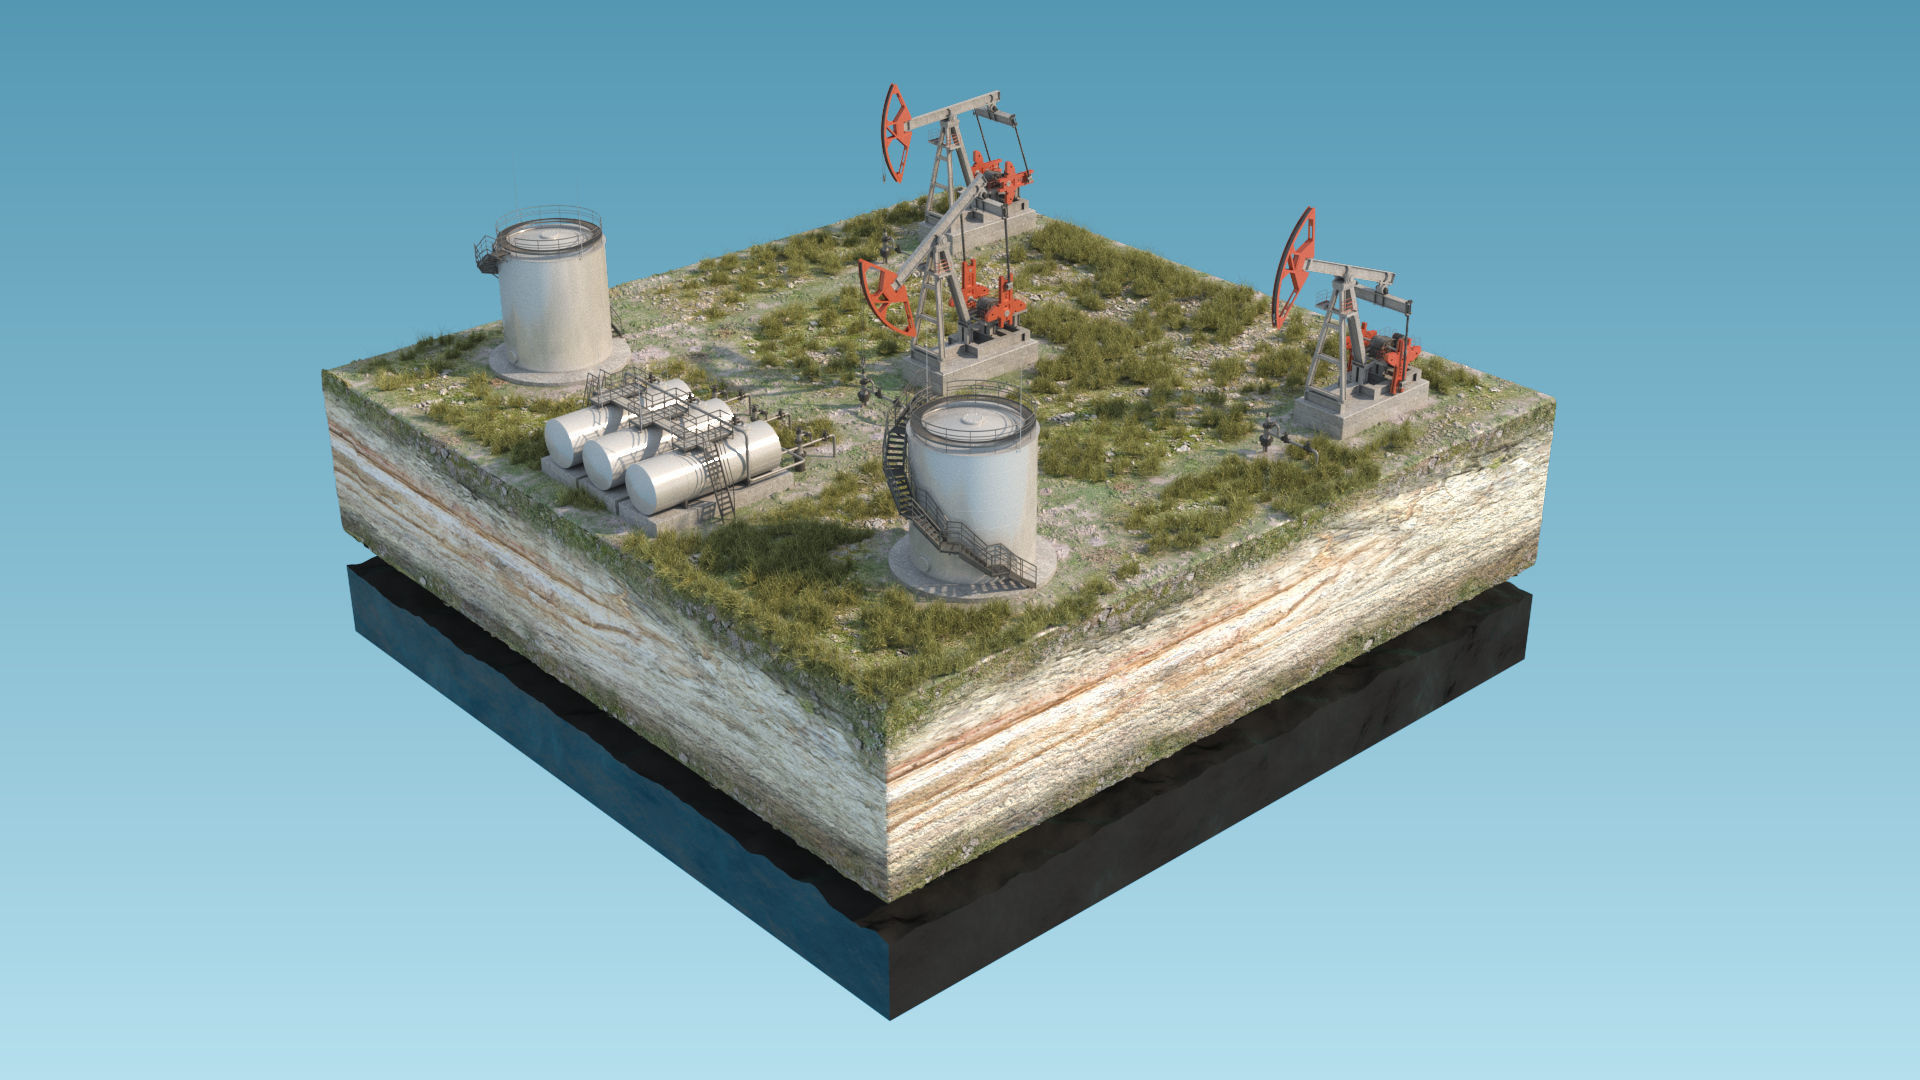 Oil Pumpjack fuel tanks